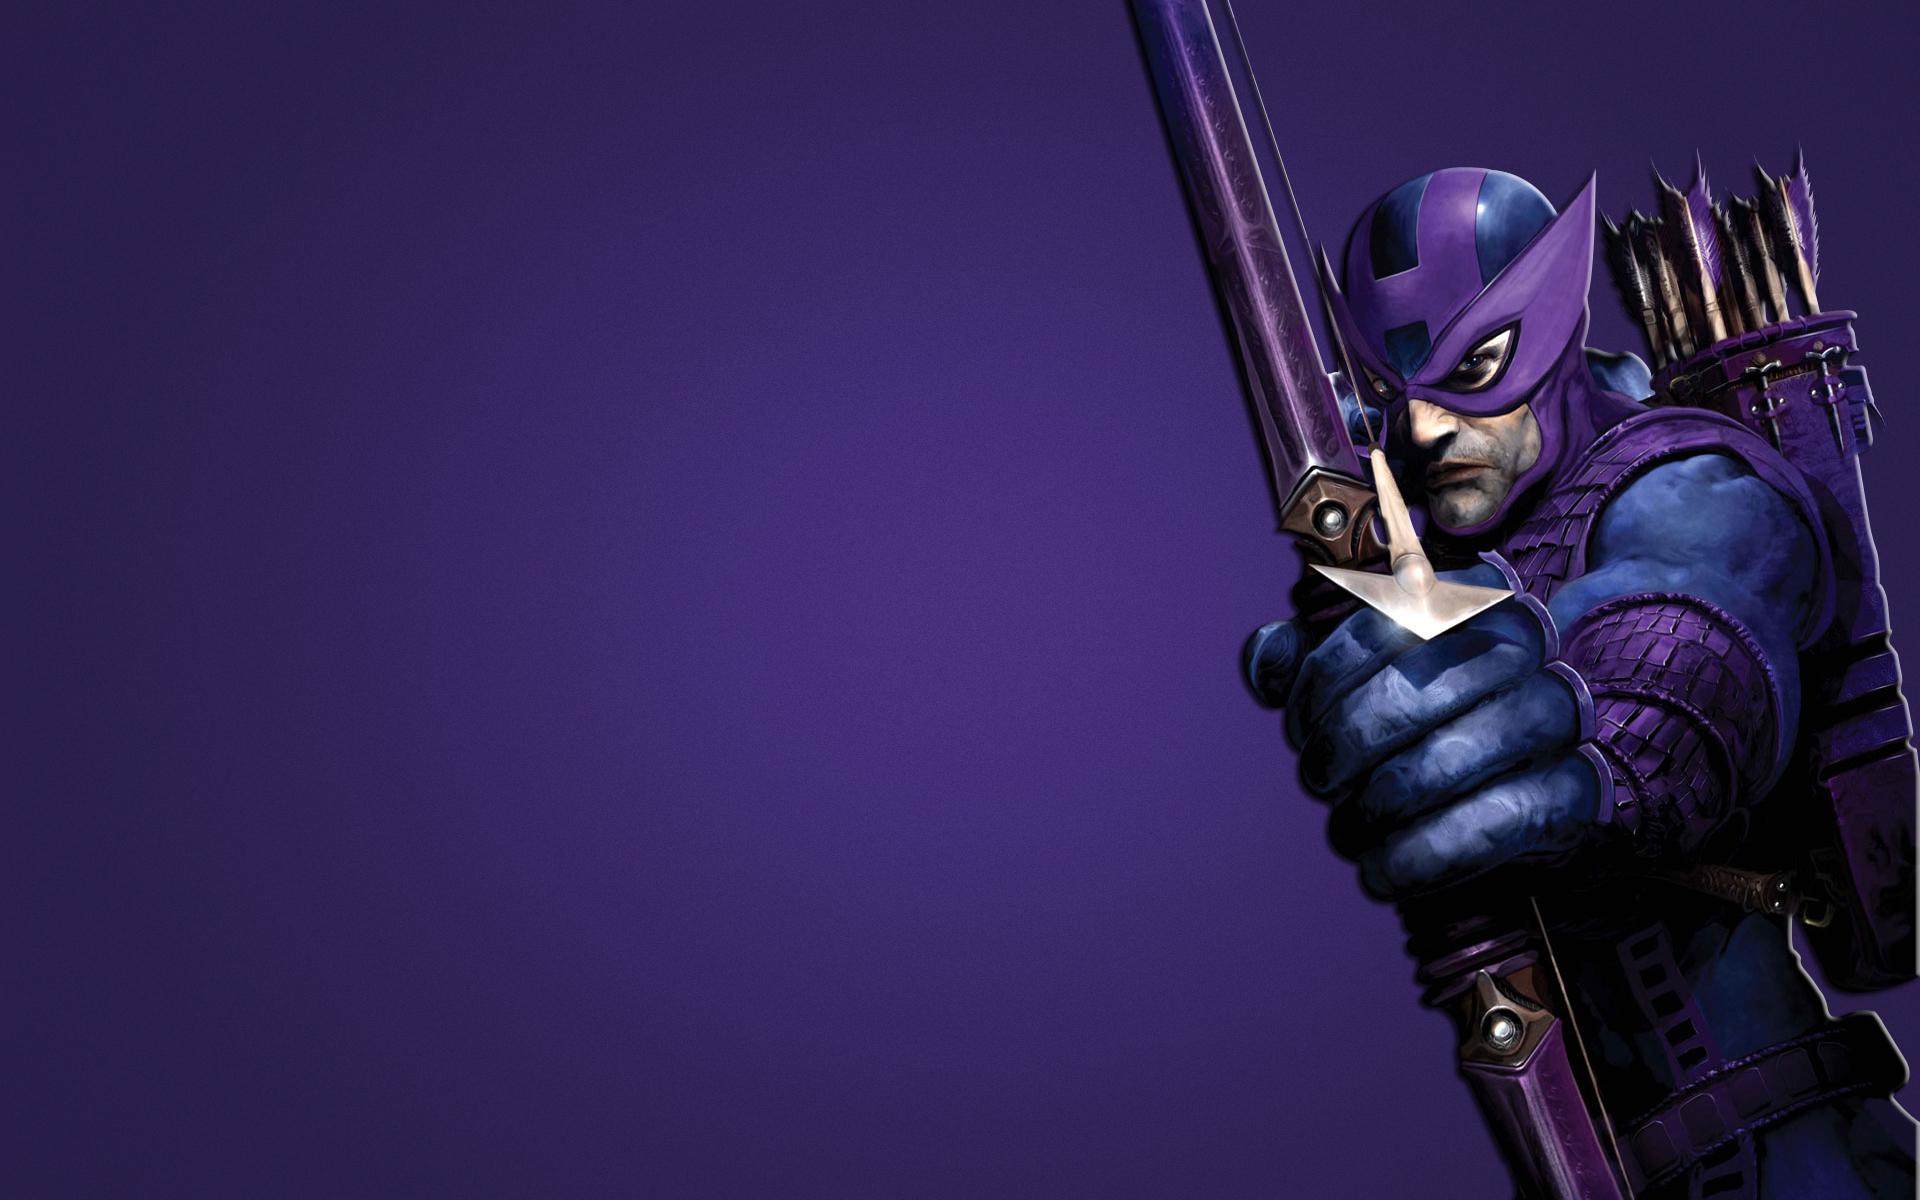 Hawkeye Marvel wallpaper   892921 1920x1200